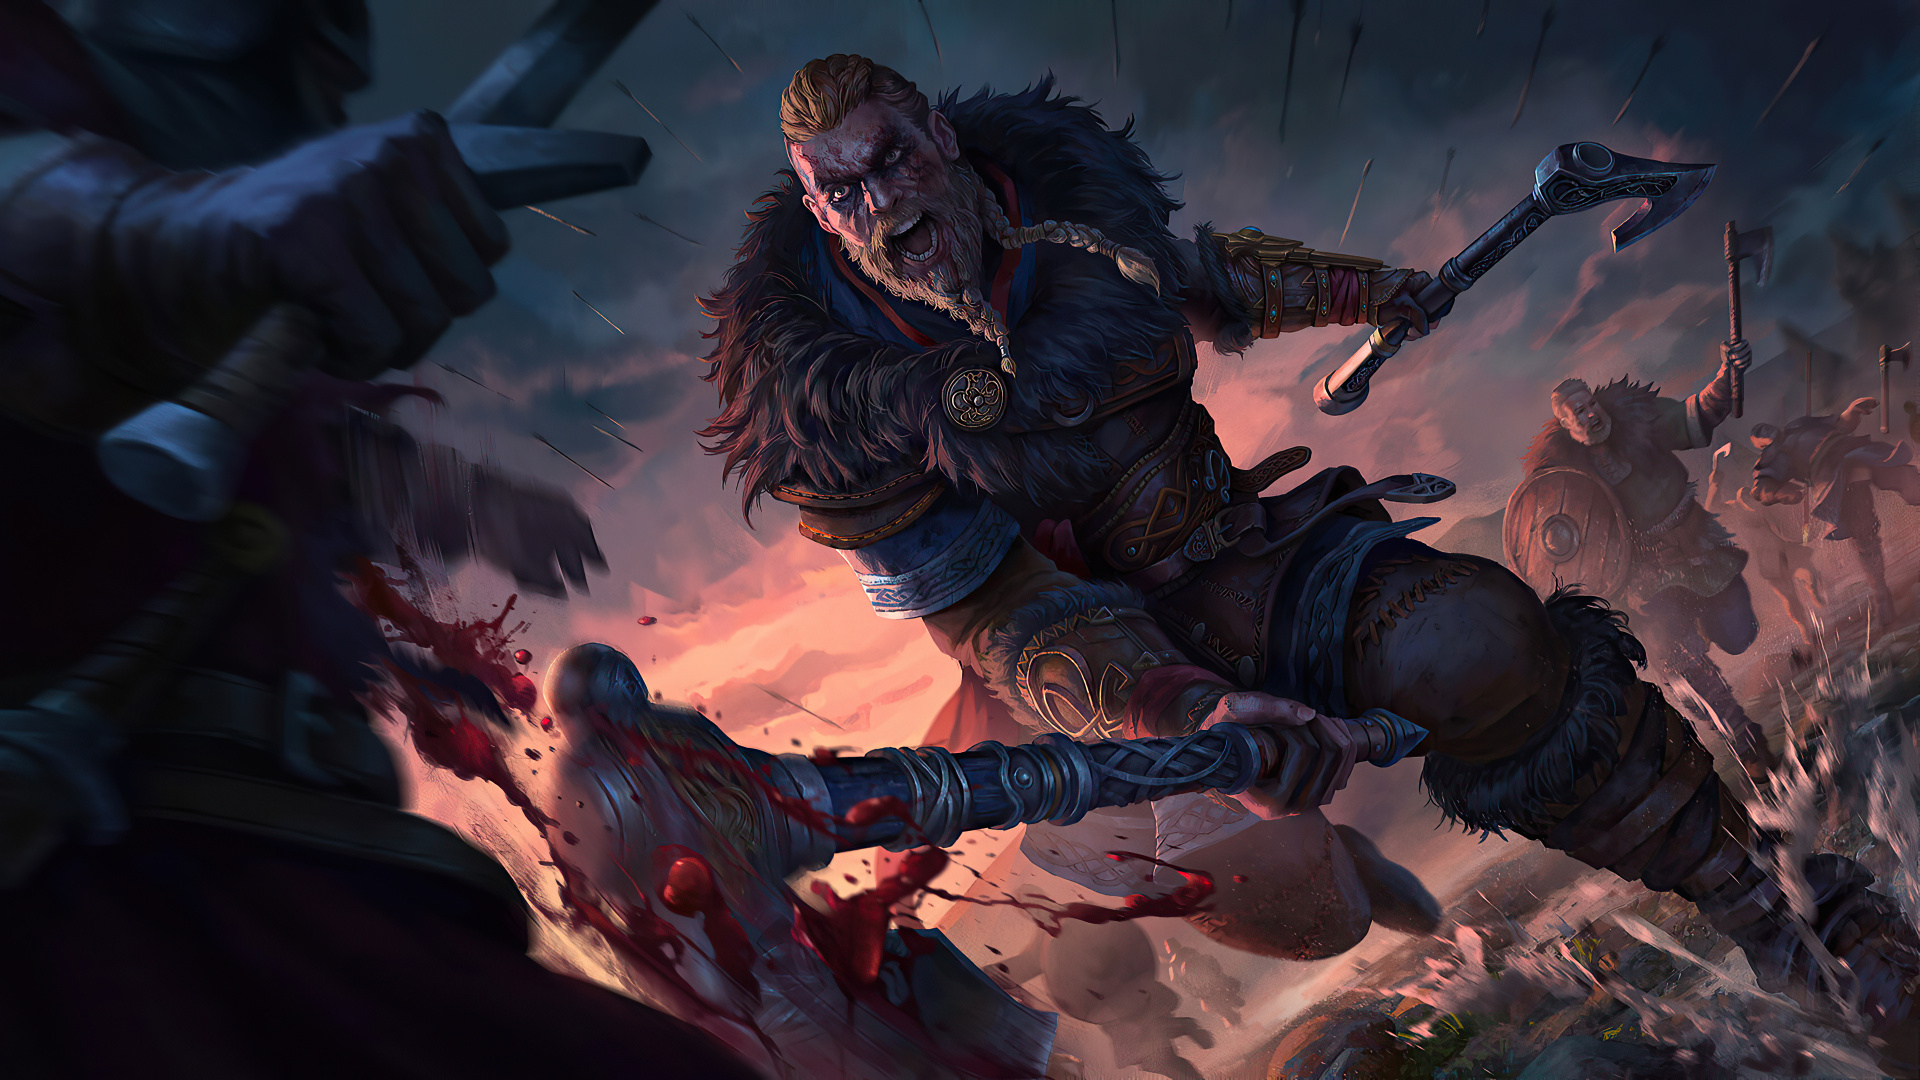 За год аудитория Epic Games Store выросла на52 млн человек — итоги EGS за 2020-й